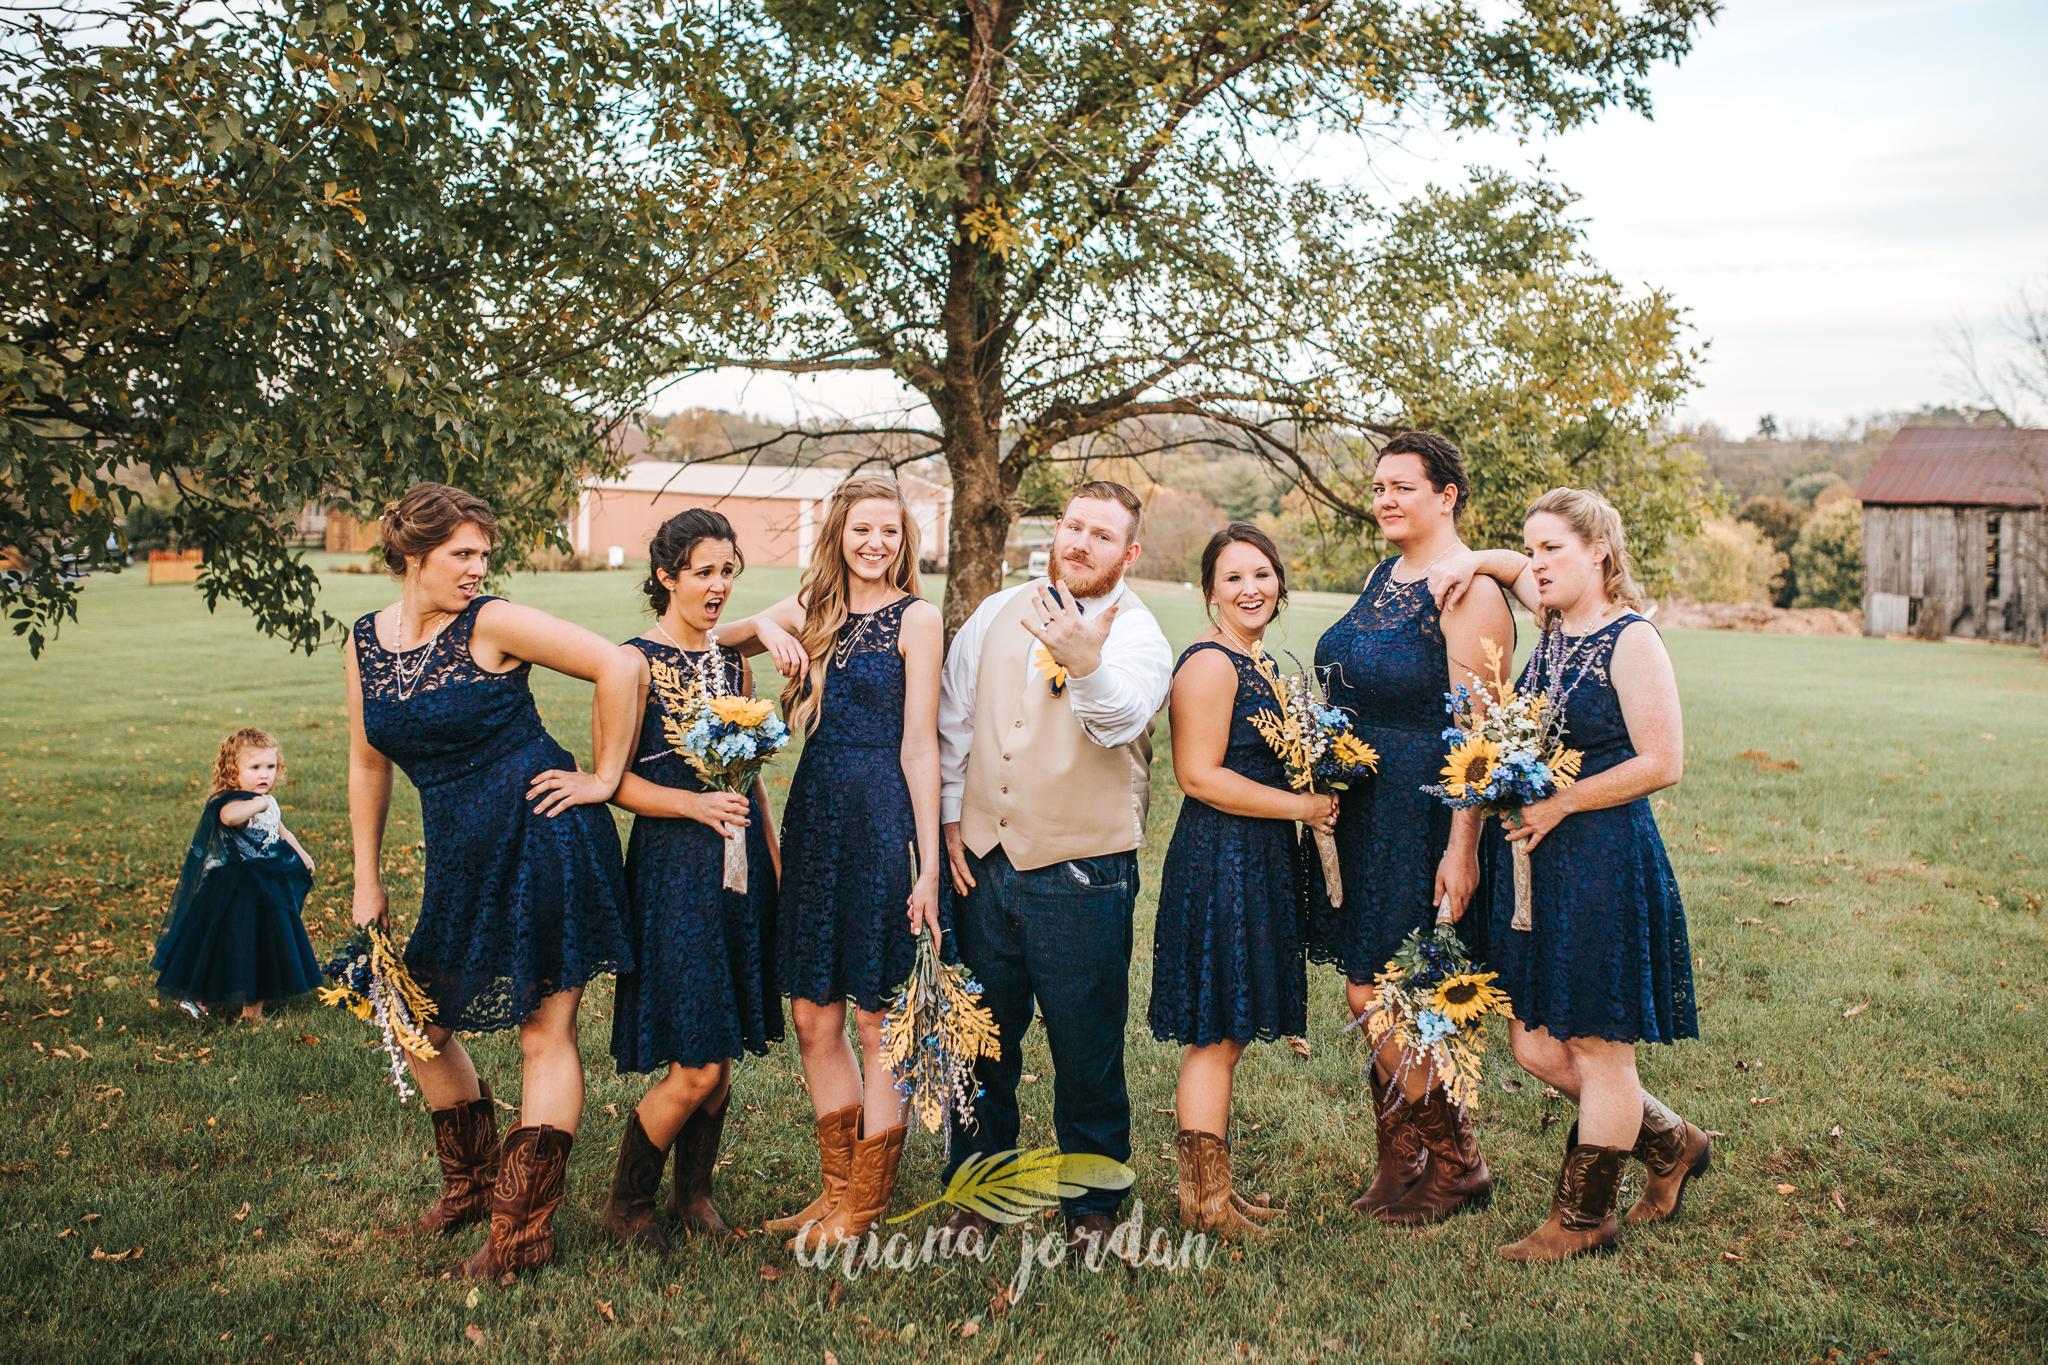 0072 Ariana Jordan Photography - Georgetown KY Wedding Photographer 8690.jpg